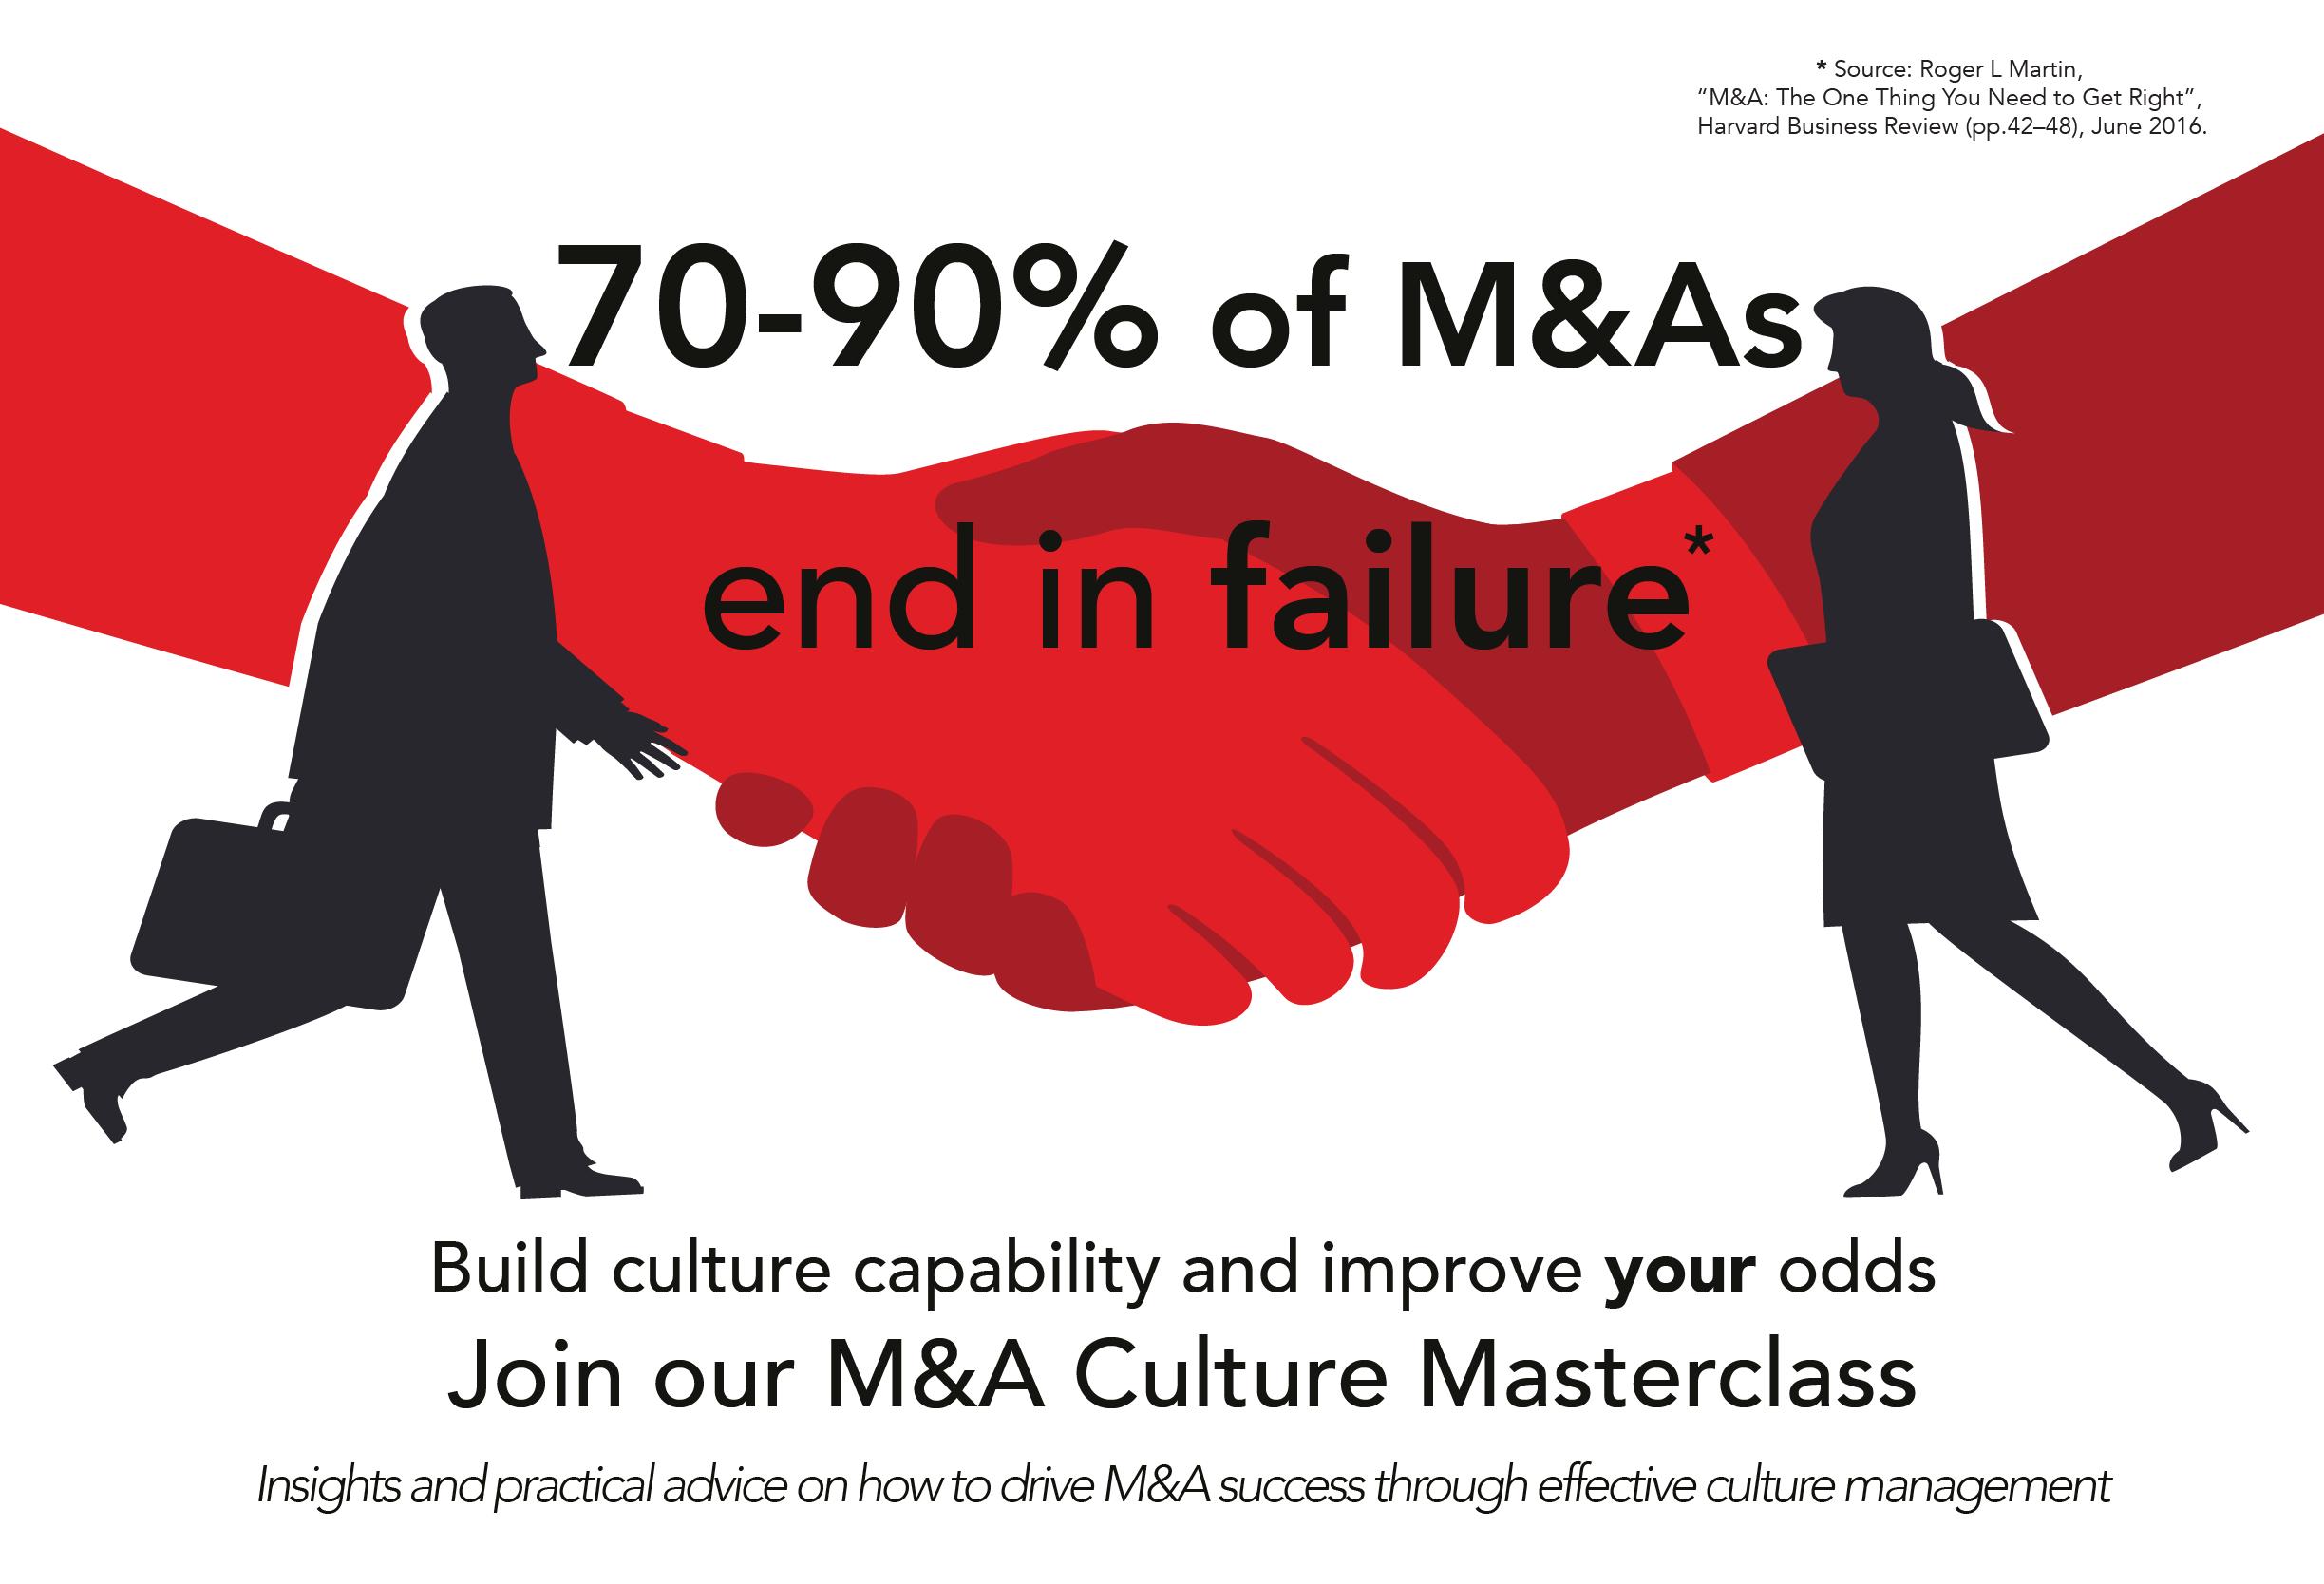 Culture Masterclass for M&A Executives